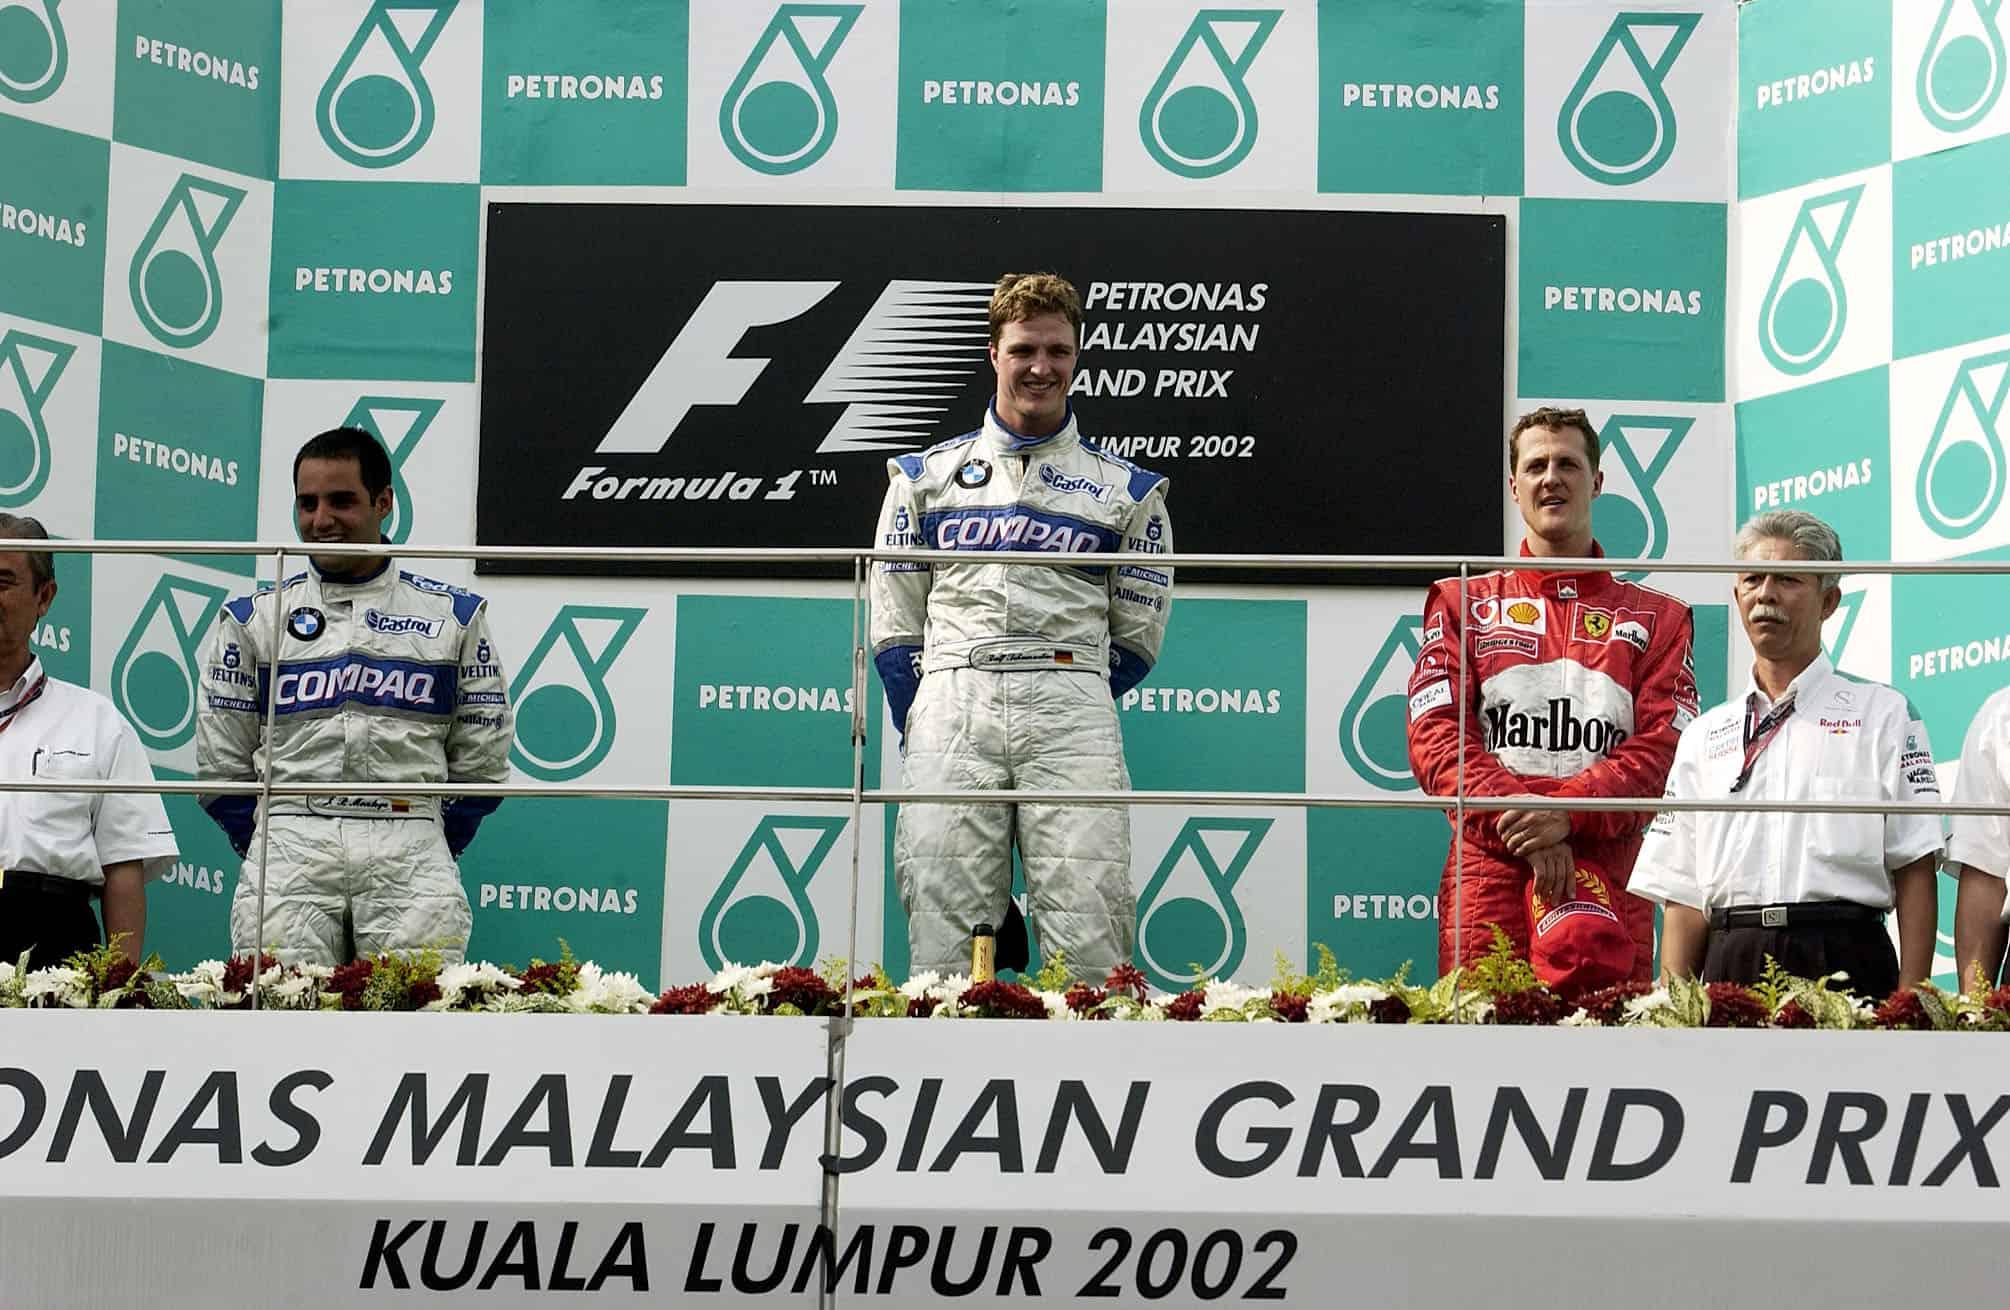 2002 Malaysian GP podium Ralf Schumacher Juan Pablo Montoya Michael Schumacher Photo Ferrari